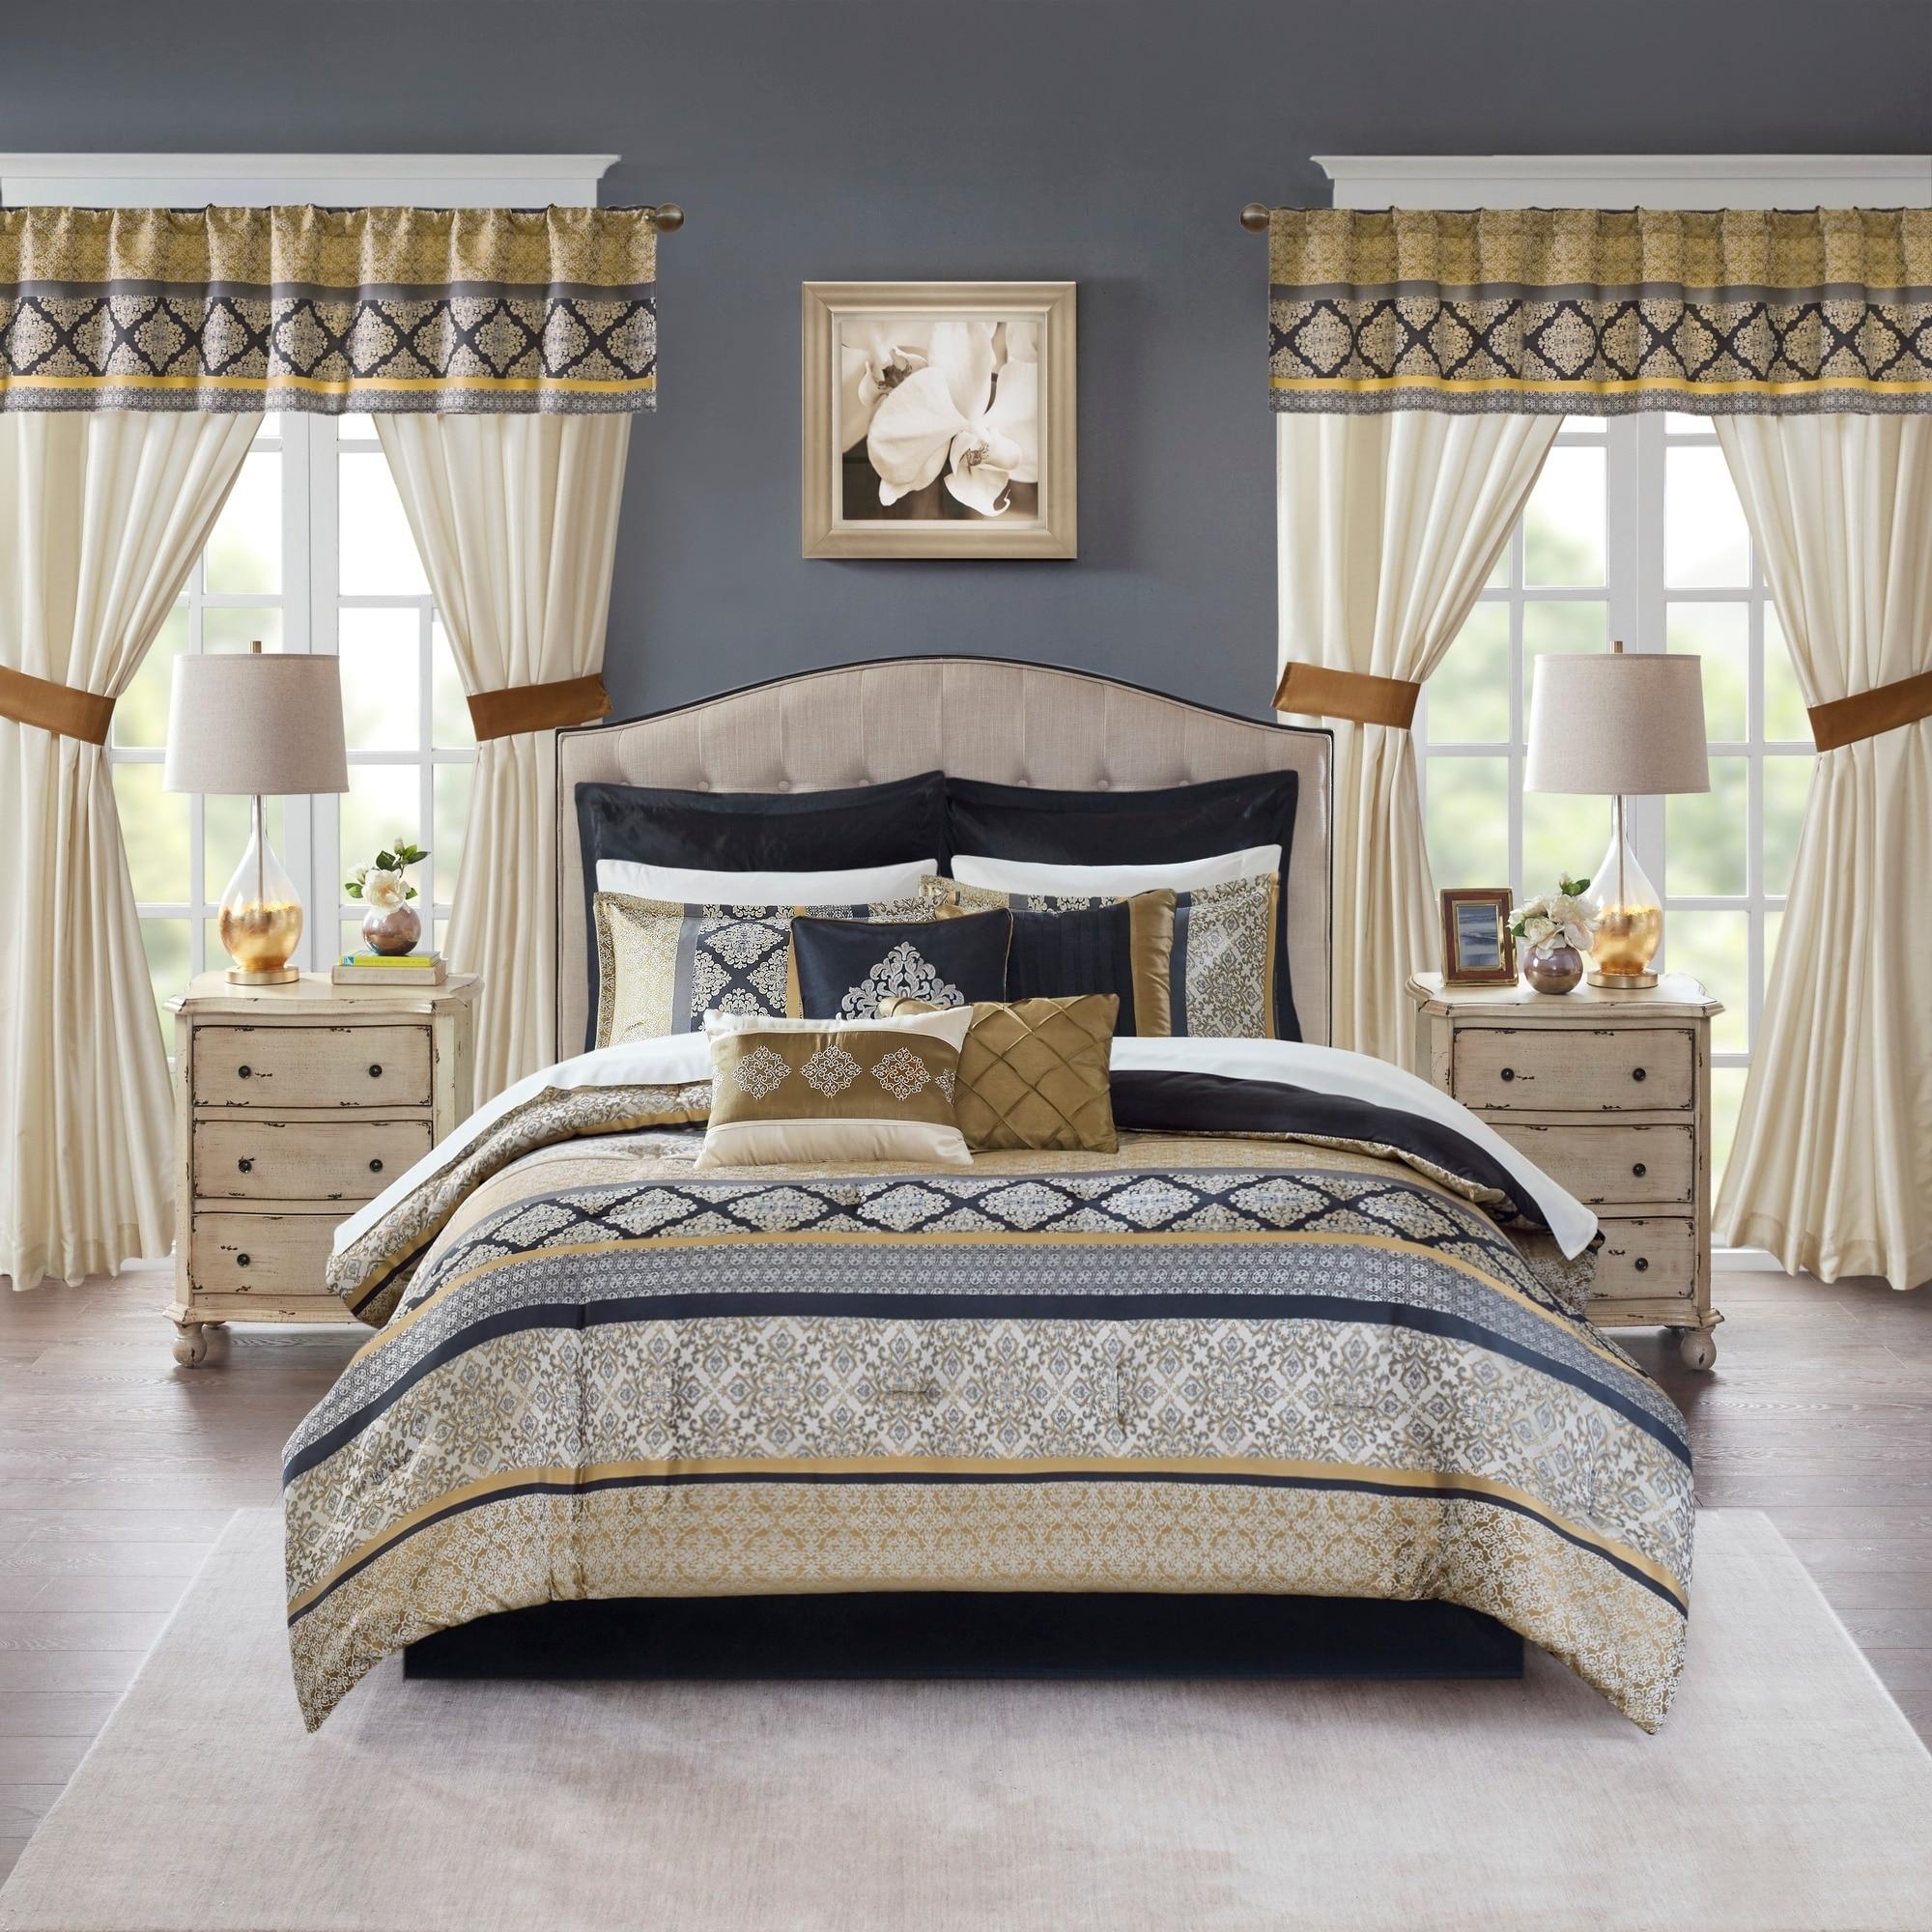 Shop Madison Park Essentials Harriet Black Gold 24 Piece Room In A Bag On Sale Overstock 24238392